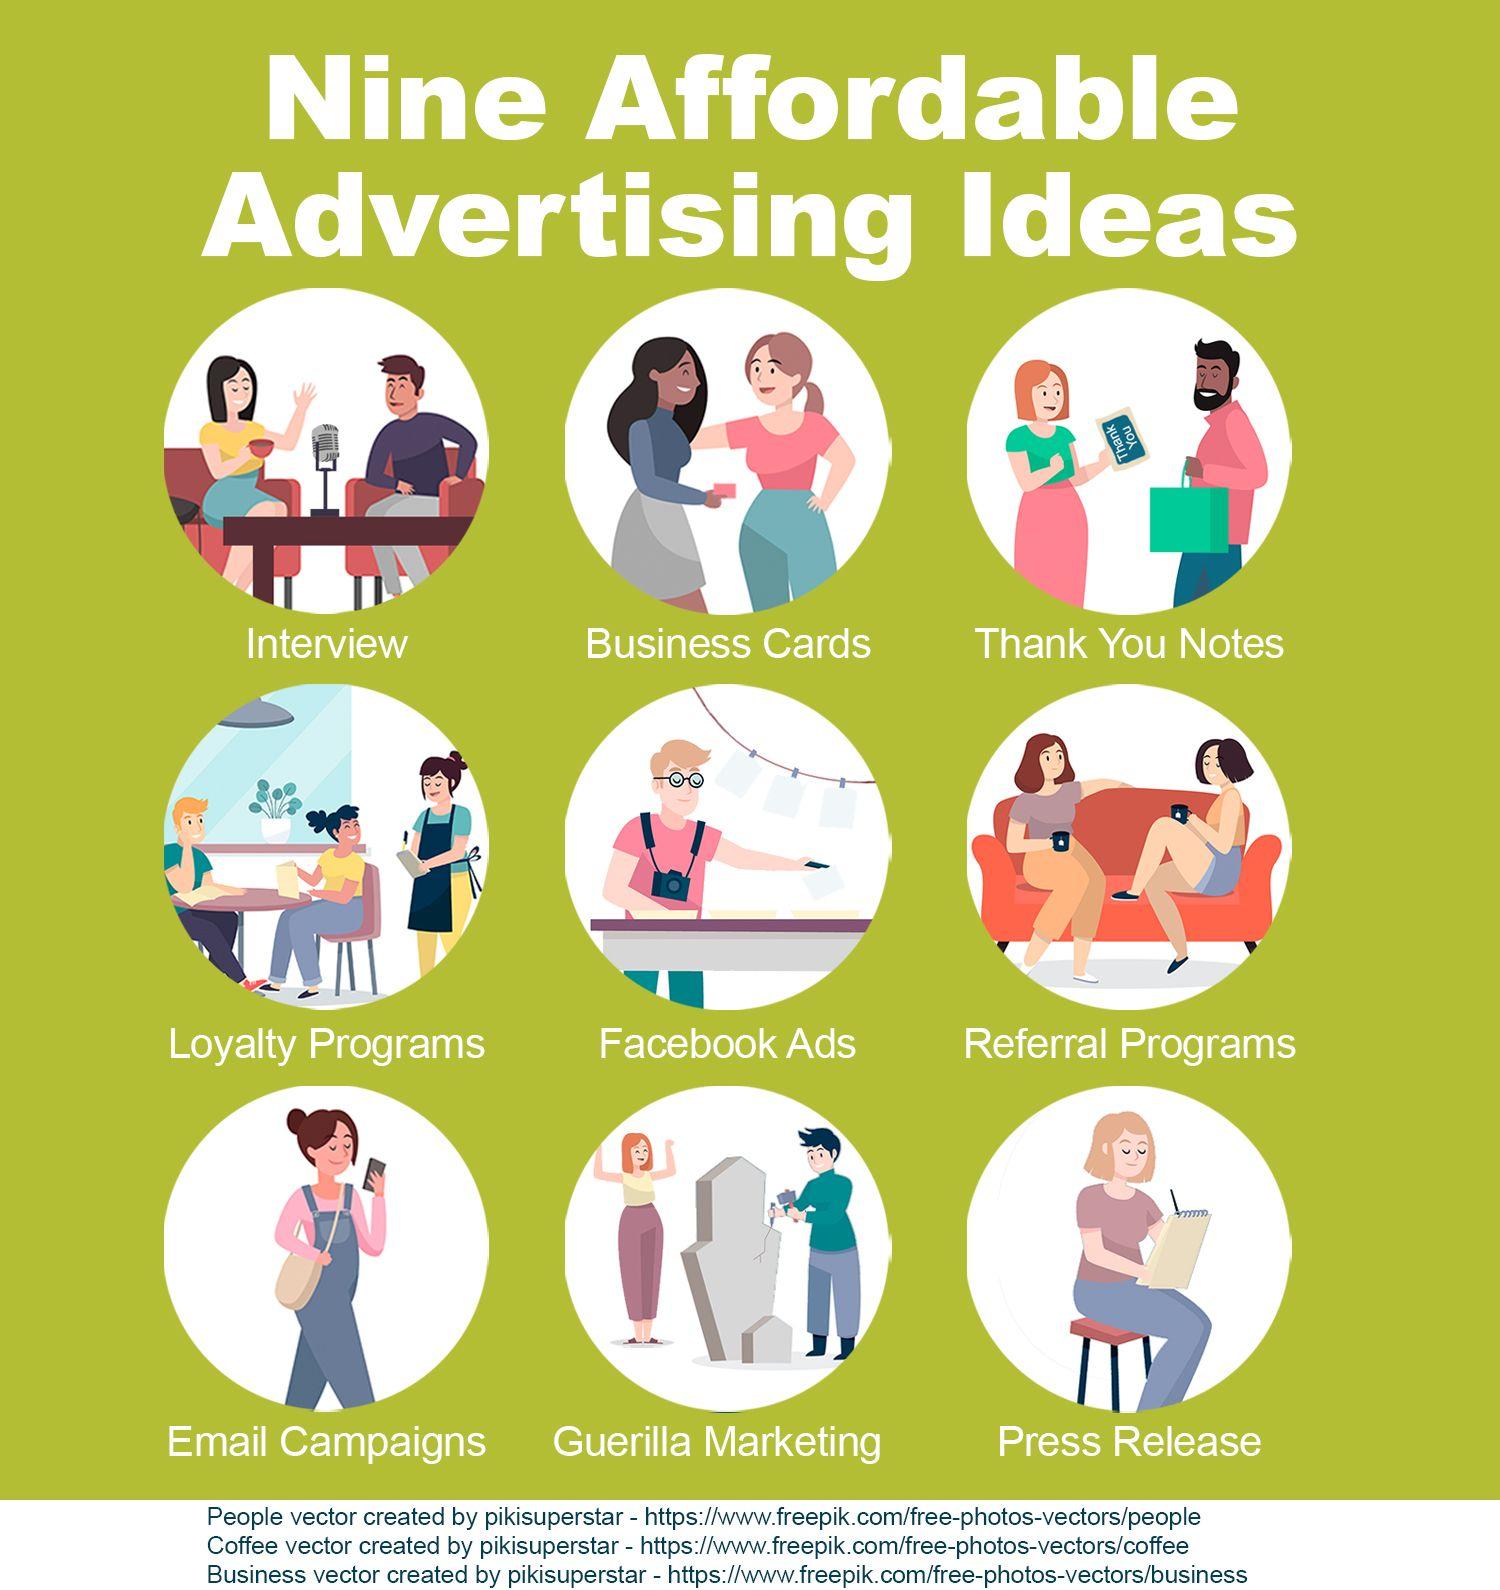 Nine Affordable Marketing Ideas